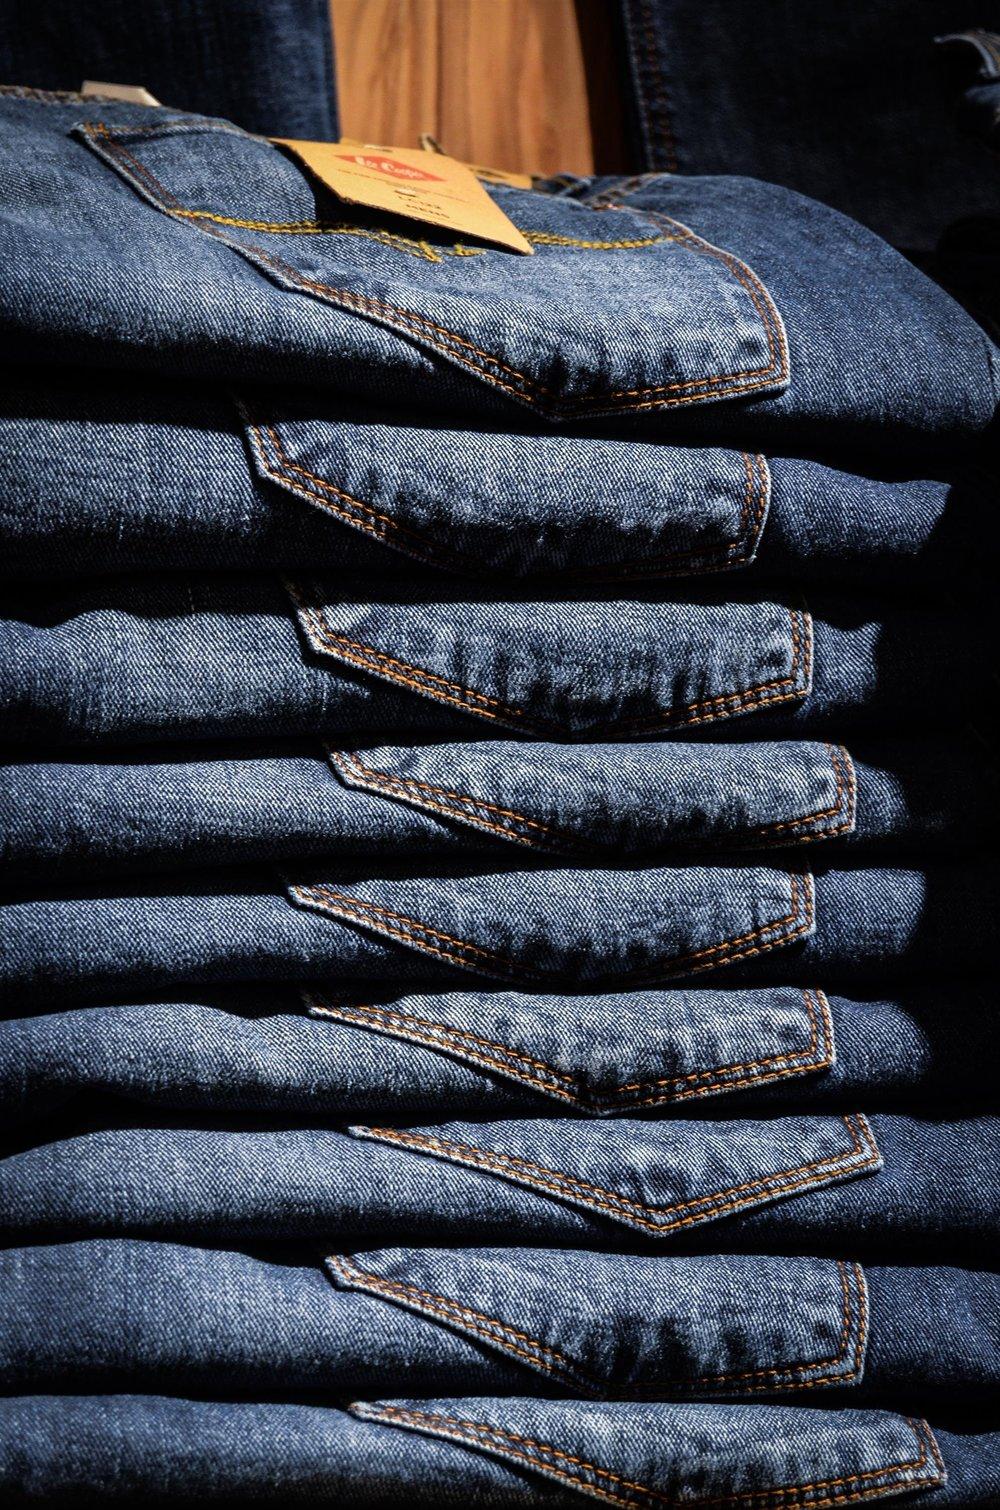 blue-clothes-clothing-52518.jpg